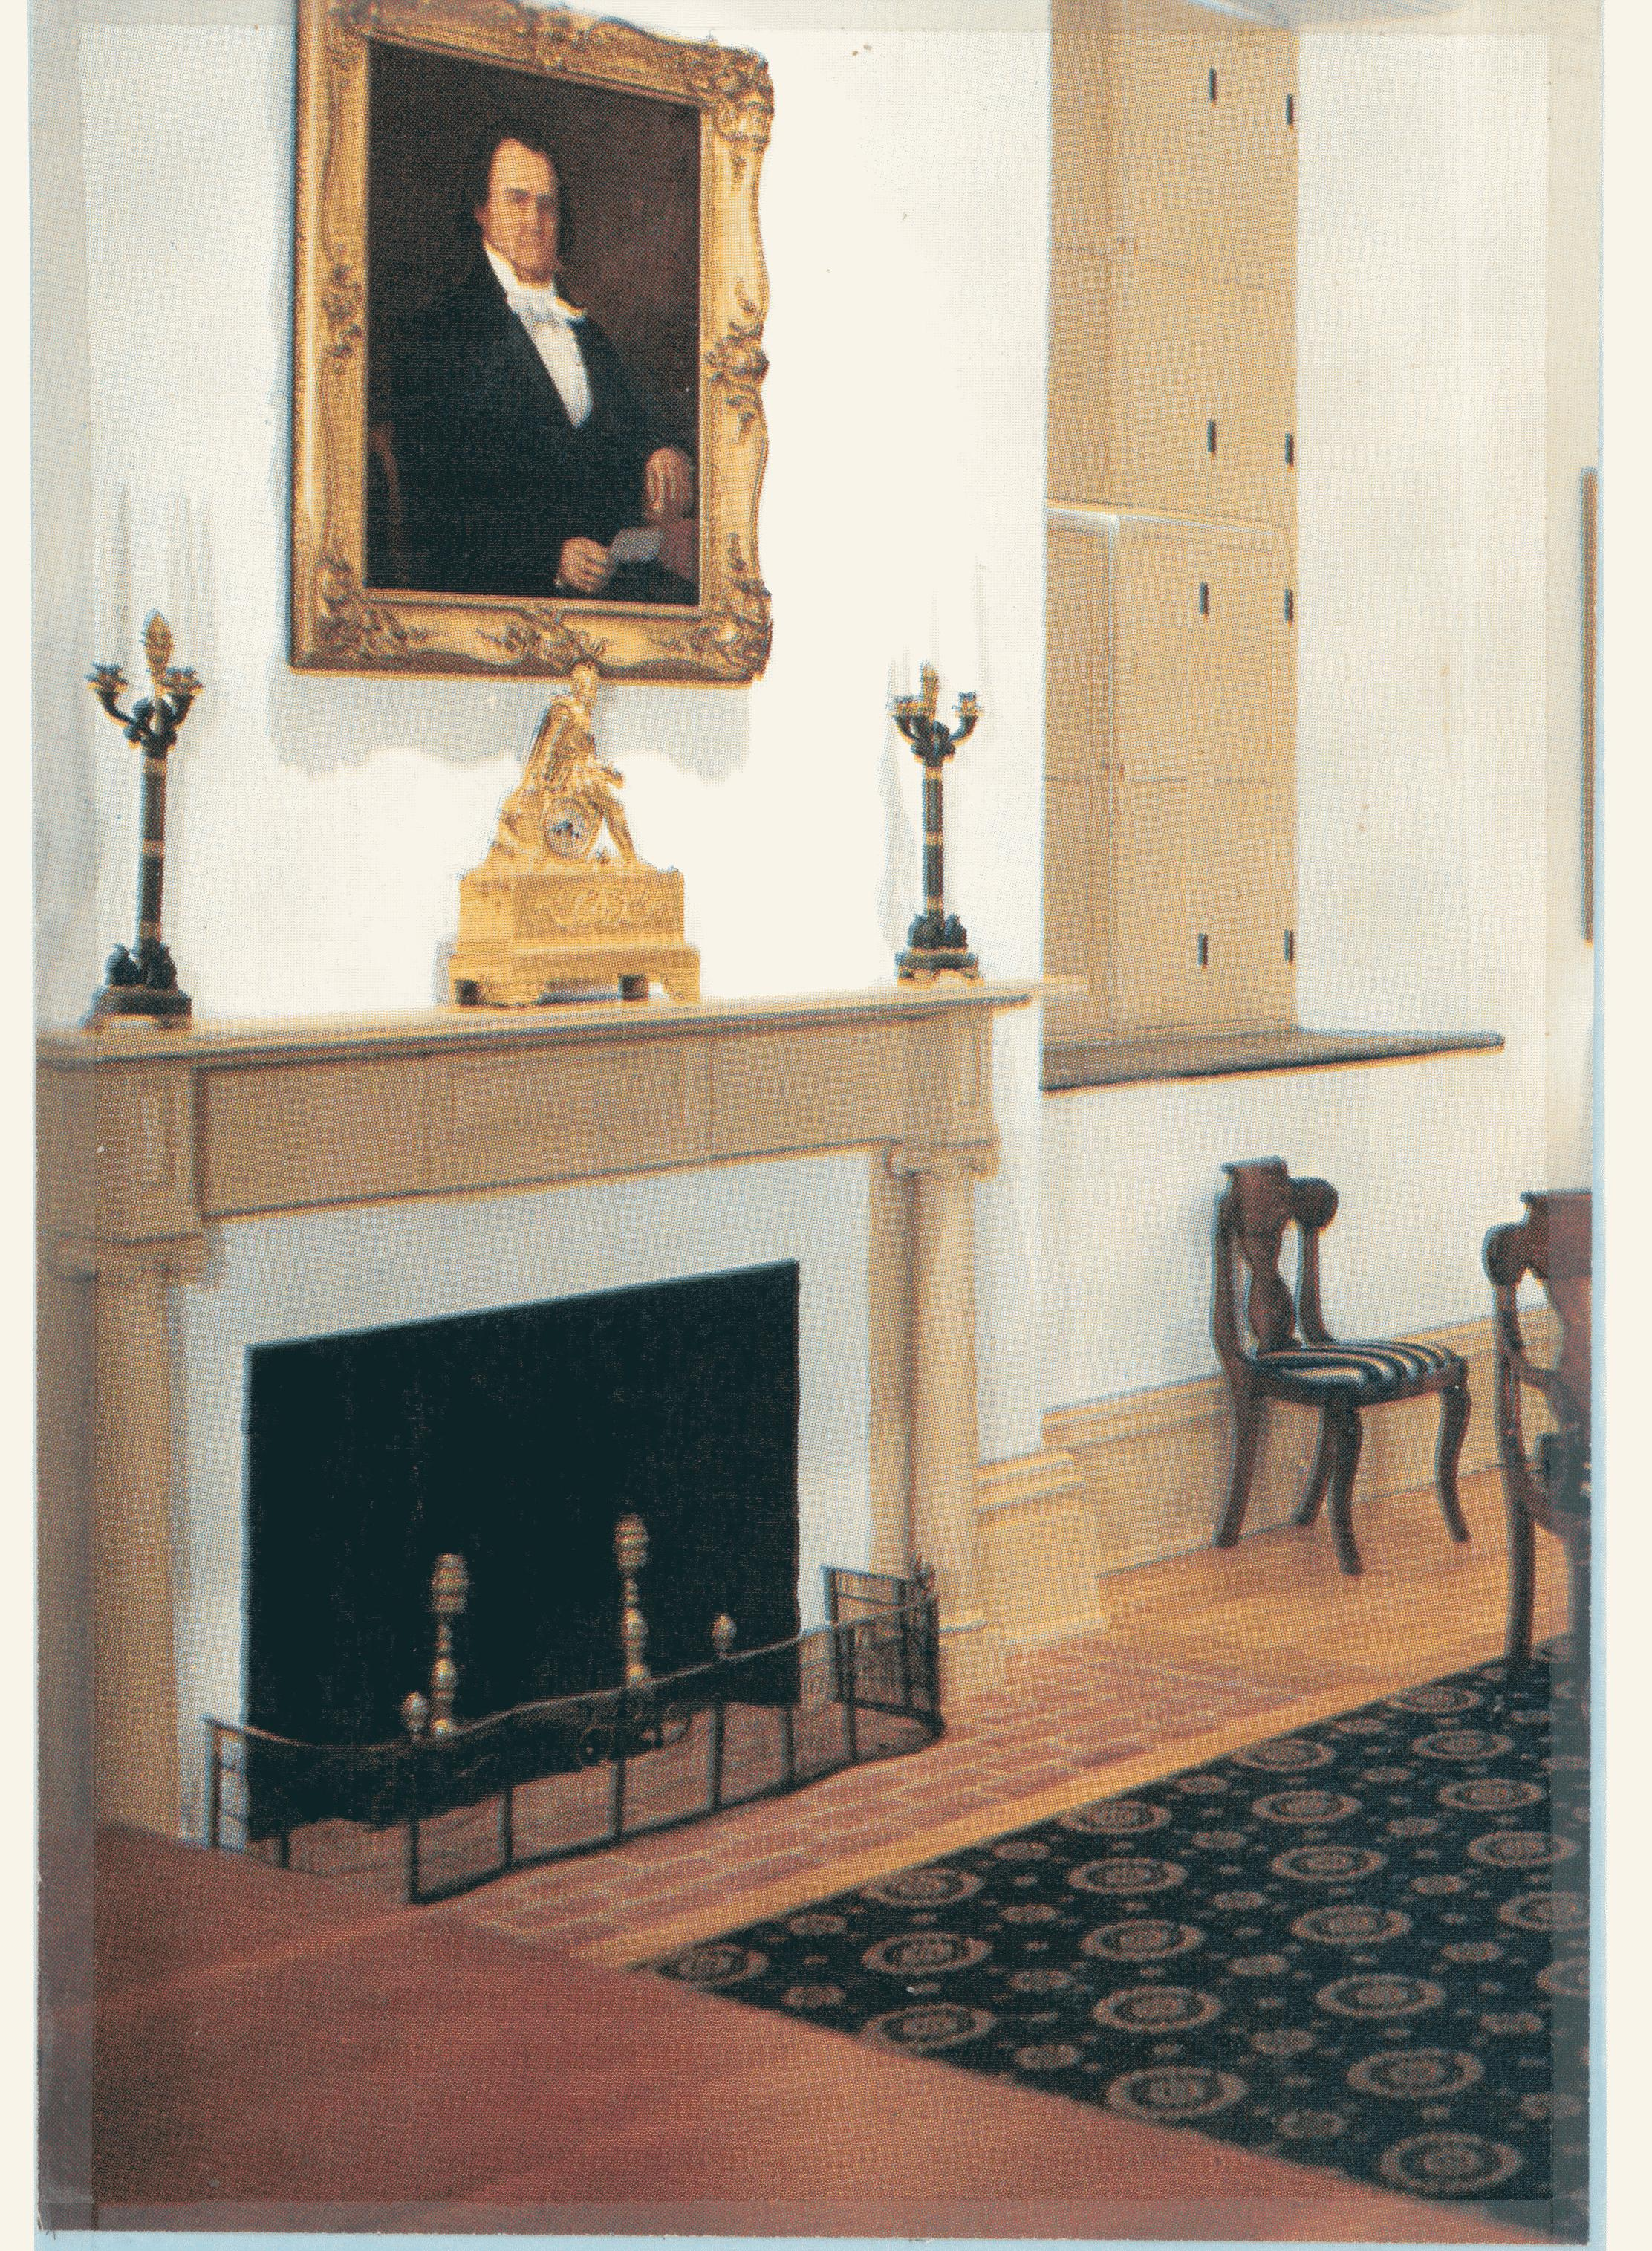 Vintage Plate Cane Ridge Old Meeting House Cabin Paris Kentucky Bourbon County Large Decorative Plate Wall Decor